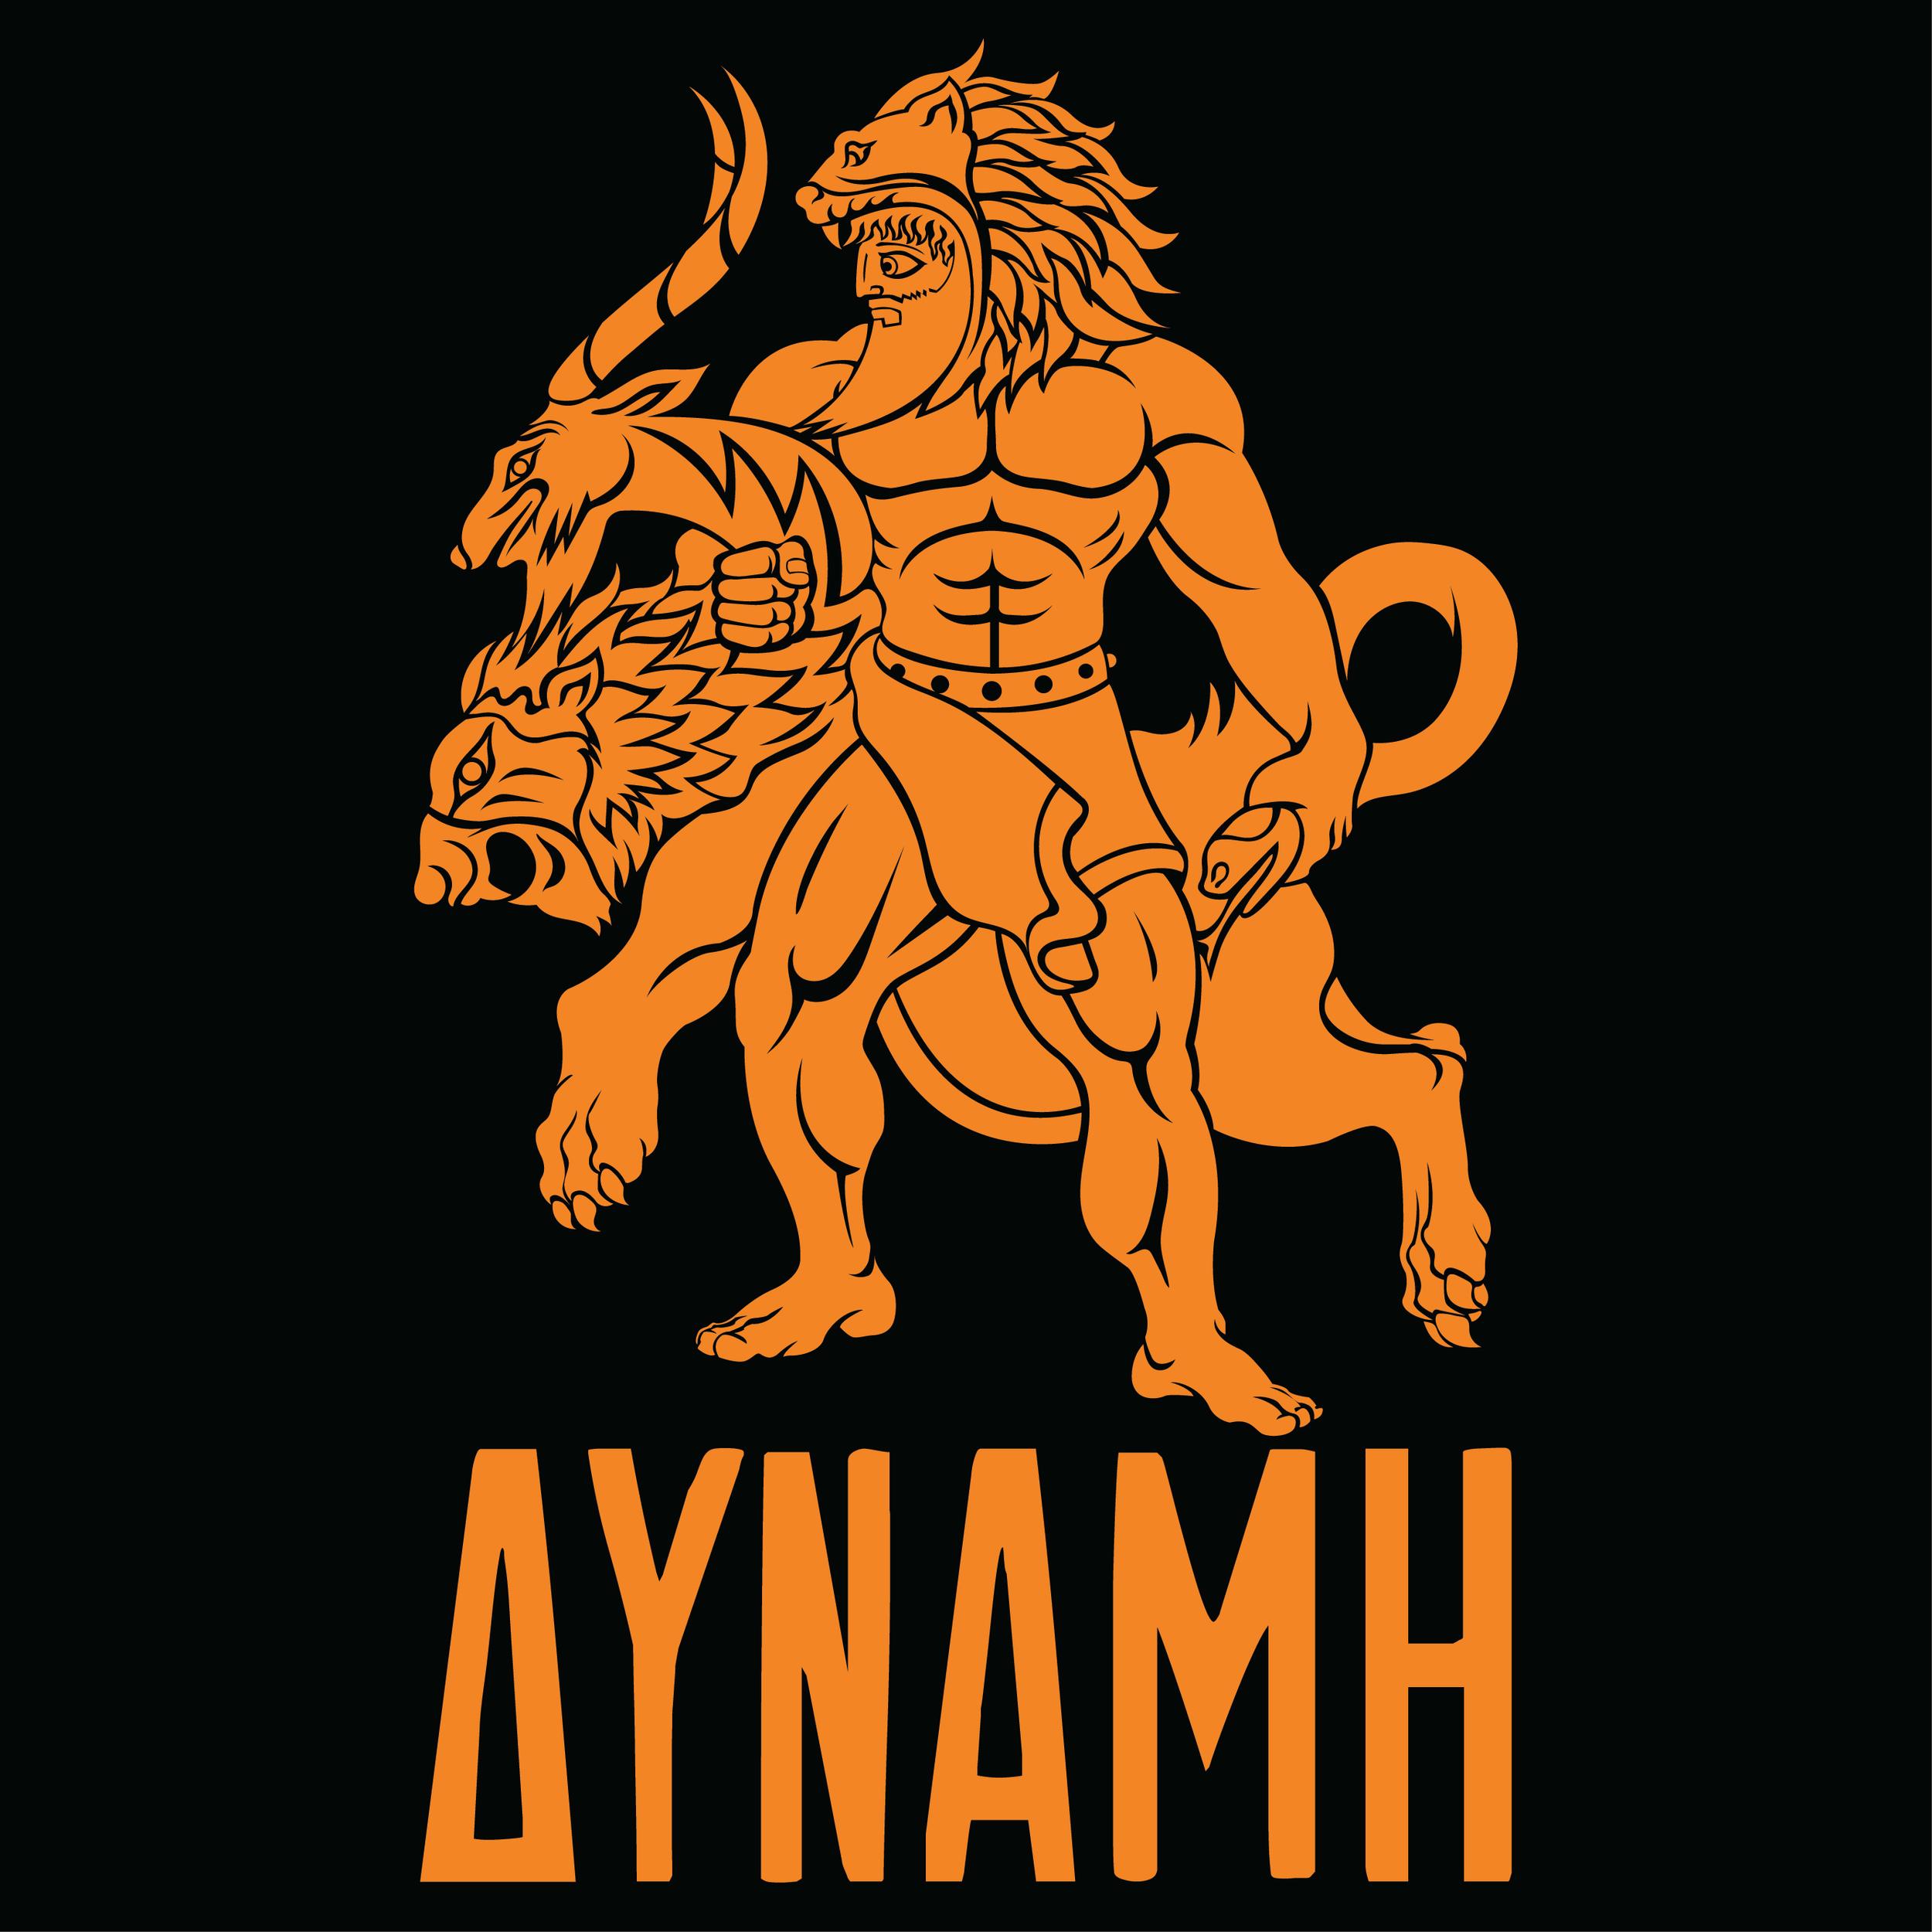 hercules-greek-mythology-mythos-cerberus-beast-12-labors-strength-illustration-adobe-illustrator-raskol-apparel-tshirt-design-roberto-orozco-orozcodesign-art-artist-roberto-artist-chimera-orange